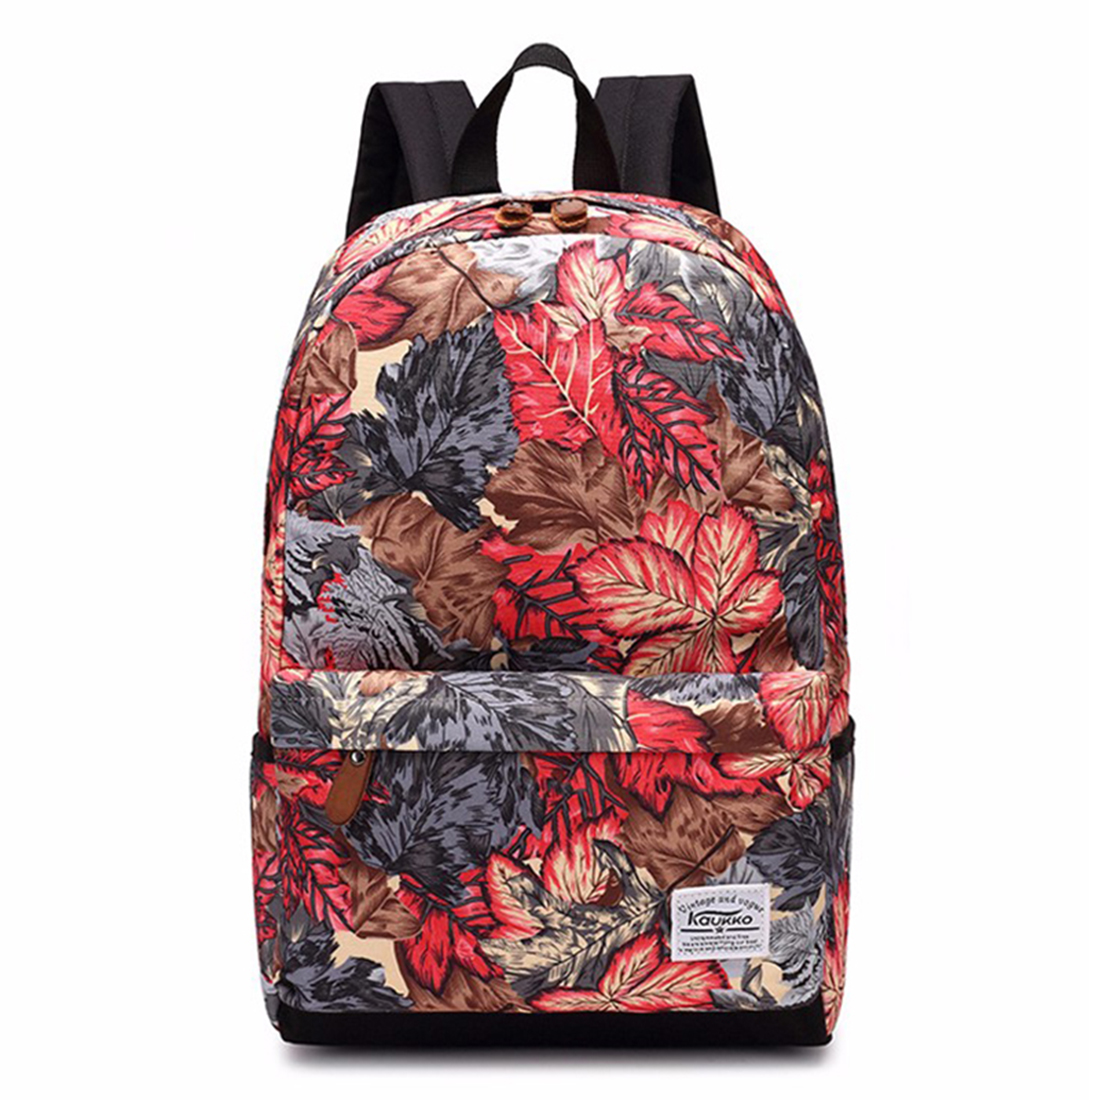 KAUKKO women travelling backpack school bags Fashion printing backpacks for teenagers girls, Maple Leaves 1pc hight quality hot fashion unisex emoji backpacks 3d printing bags drawstring backpack nov 10